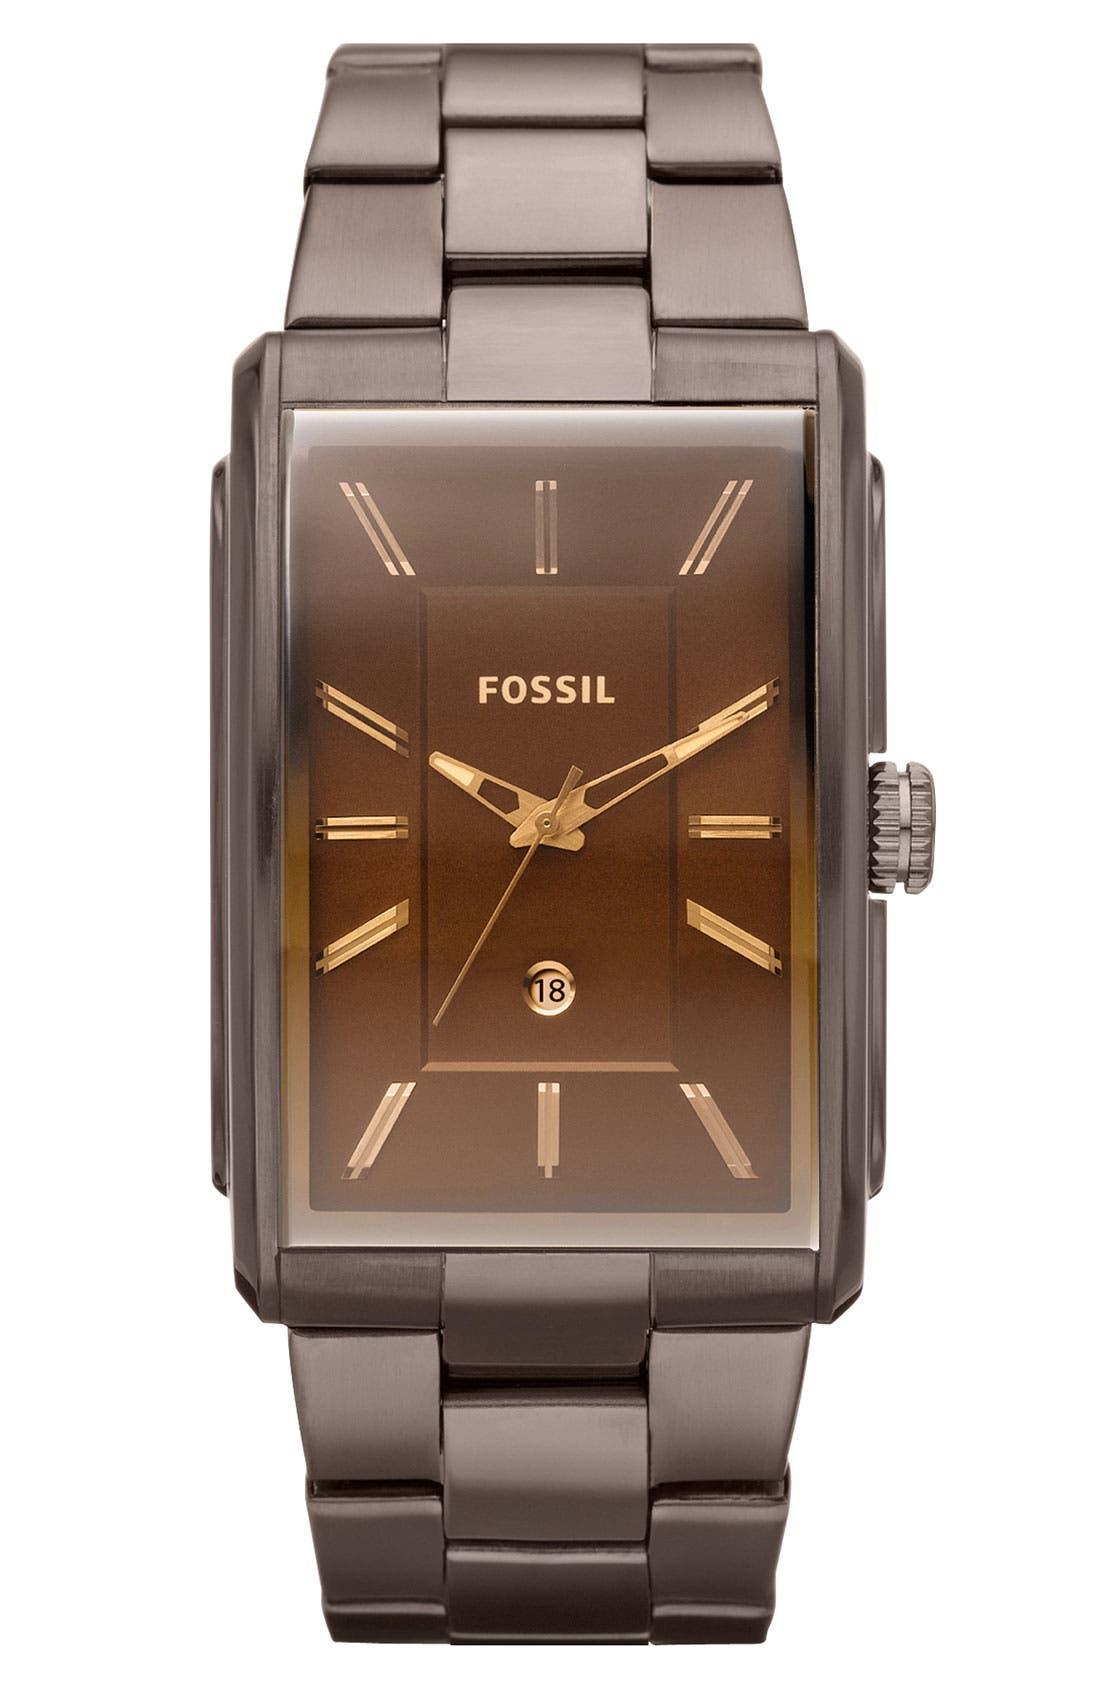 Main Image - Fossil 'Heritage' Rectangular Bracelet Watch, 33mm x 49mm